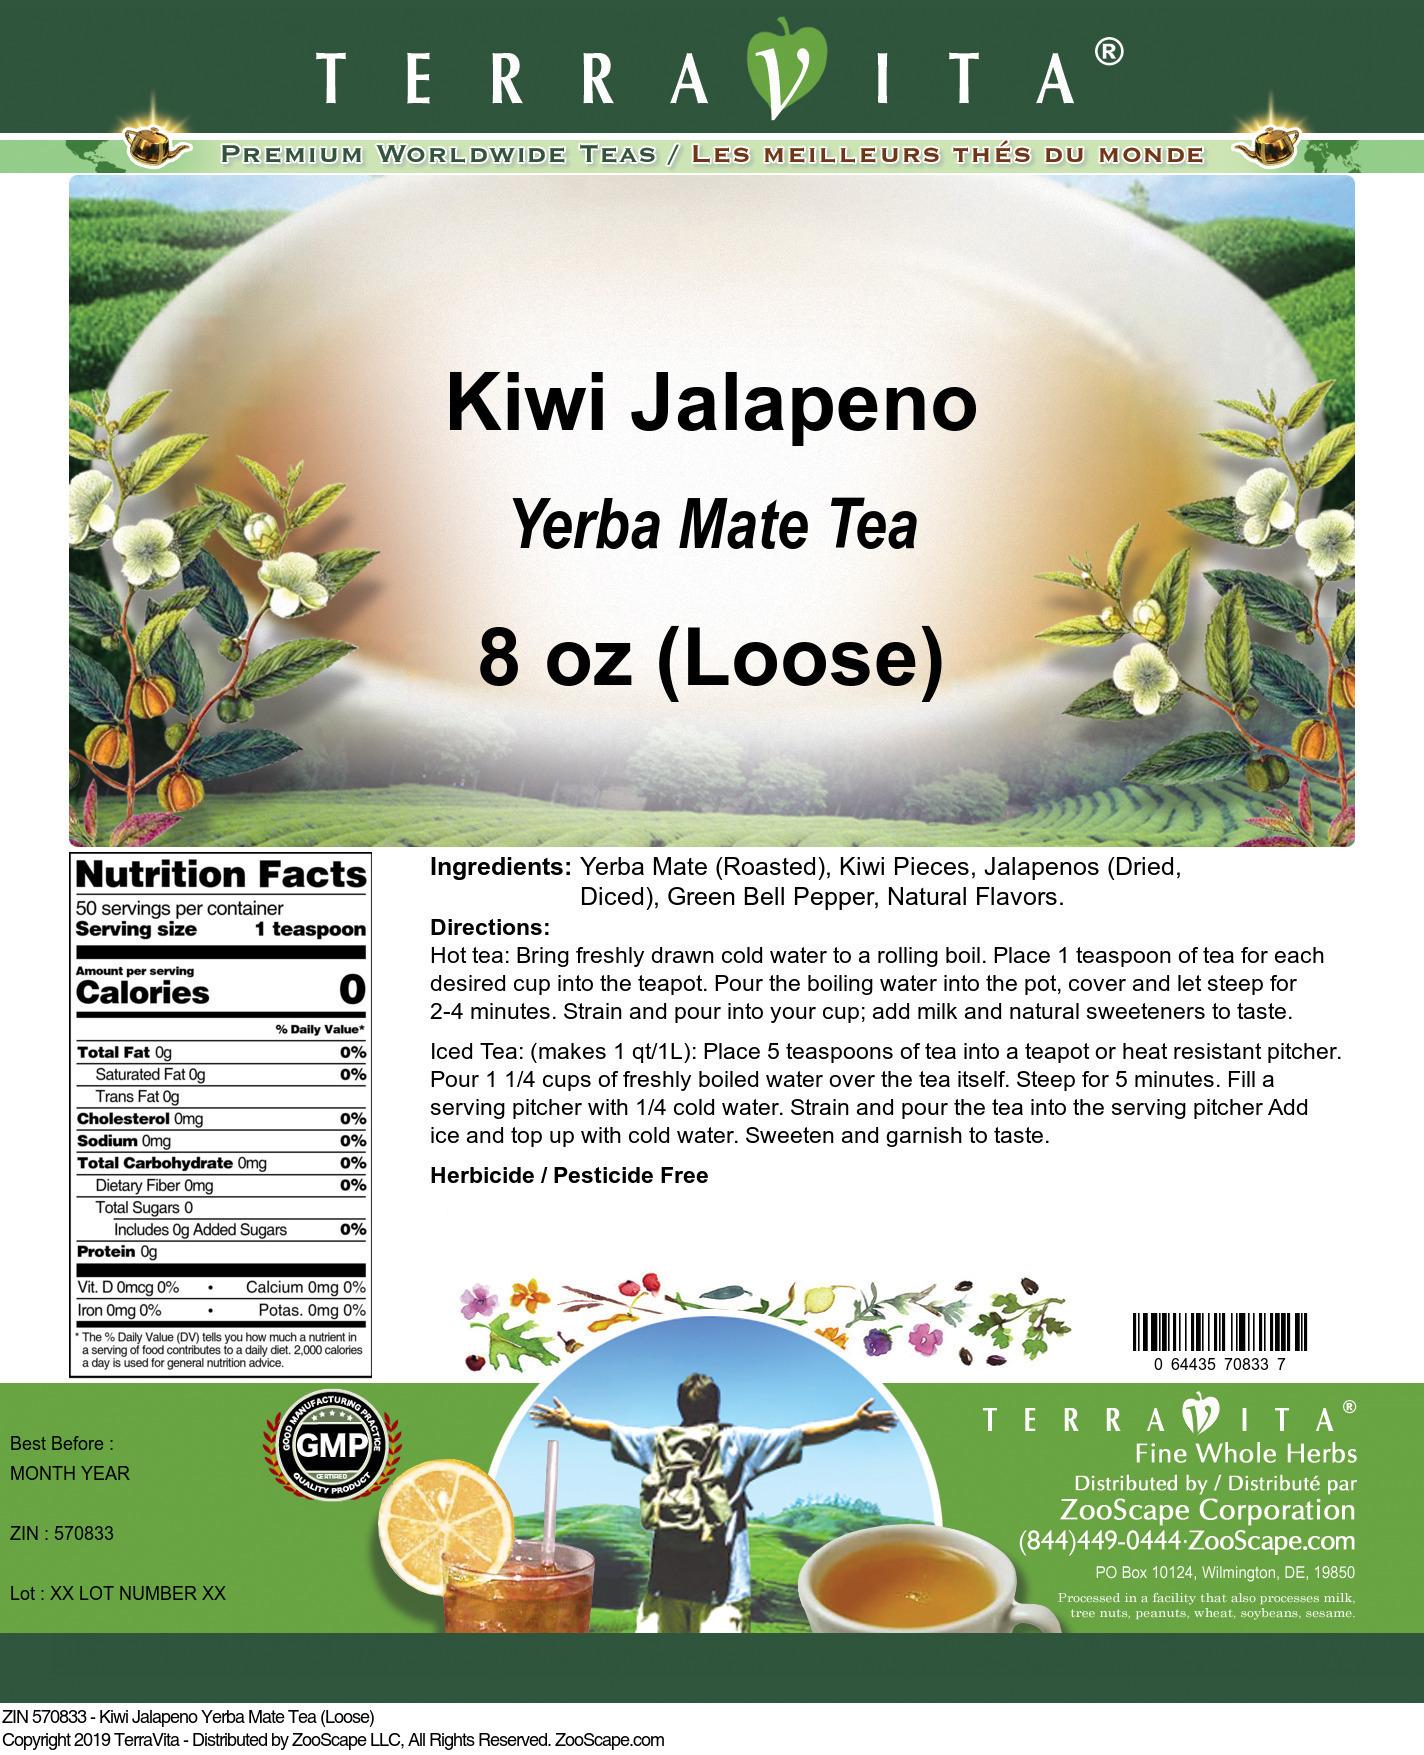 Kiwi Jalapeno Yerba Mate